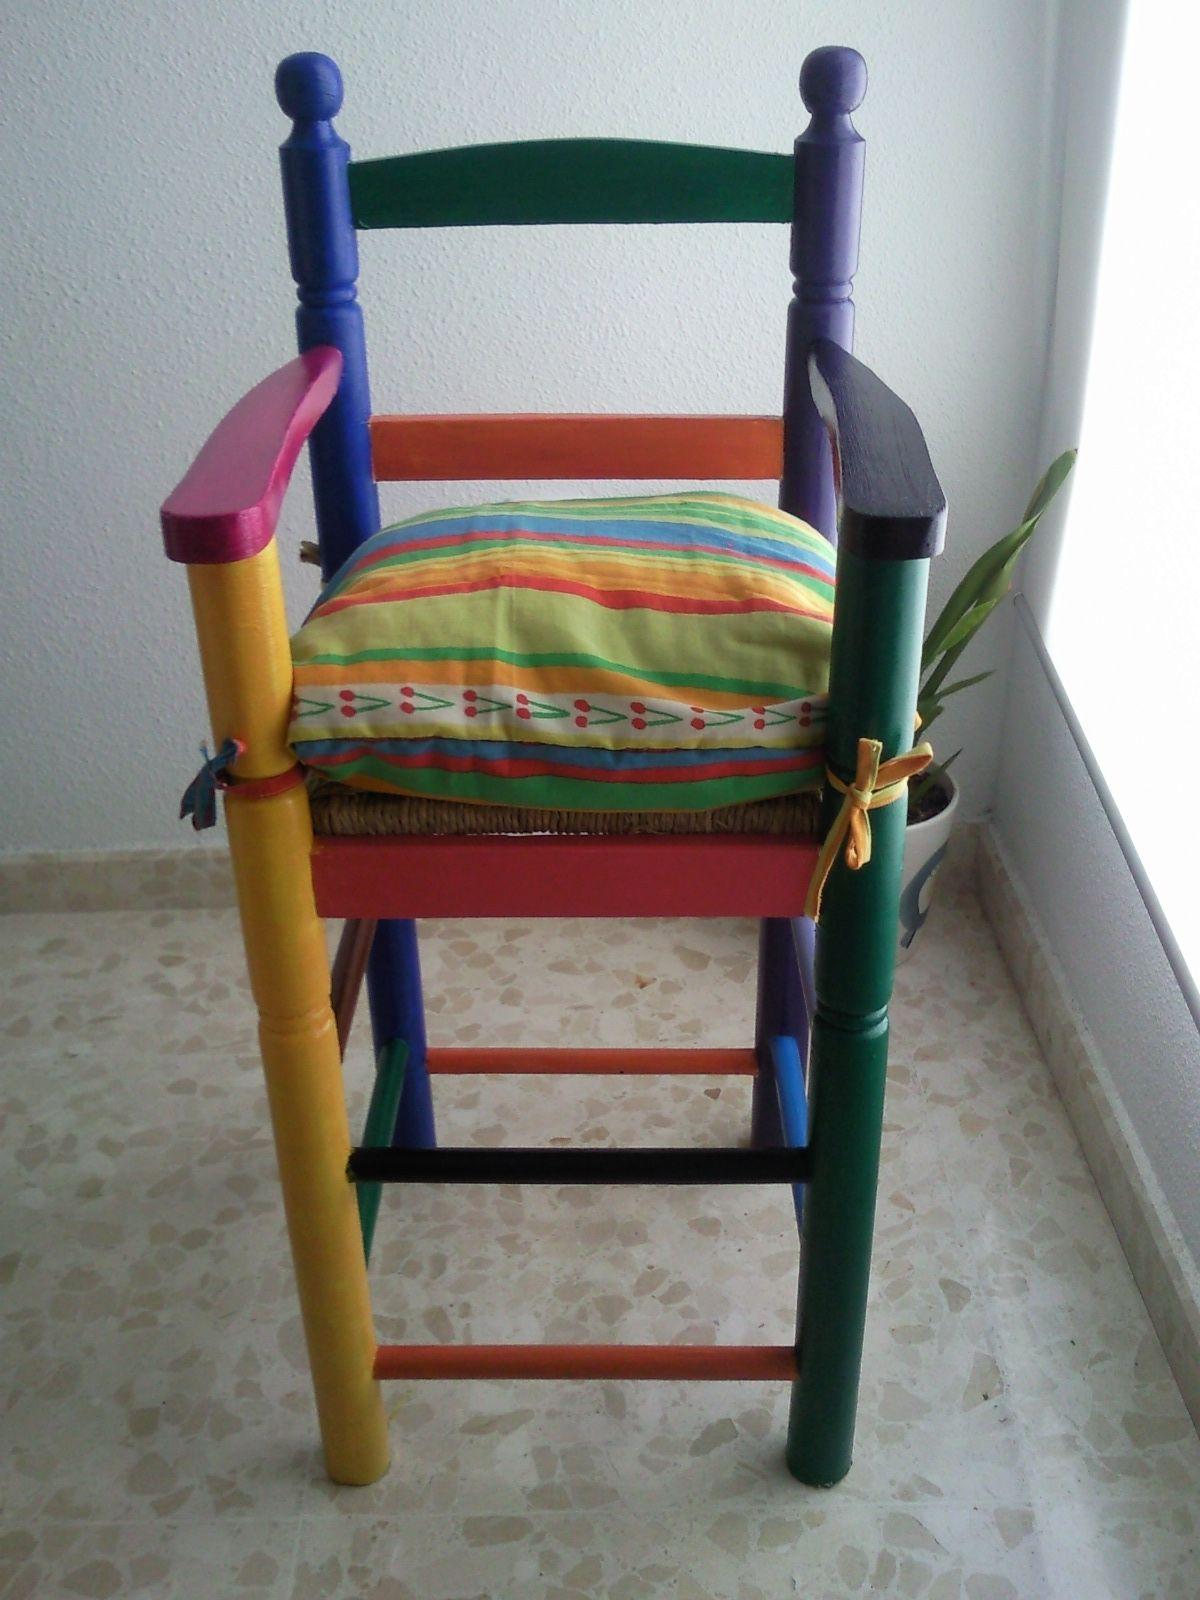 silla pintada | cillas | Pinterest | Sillas, Pintar y Manualidades ...